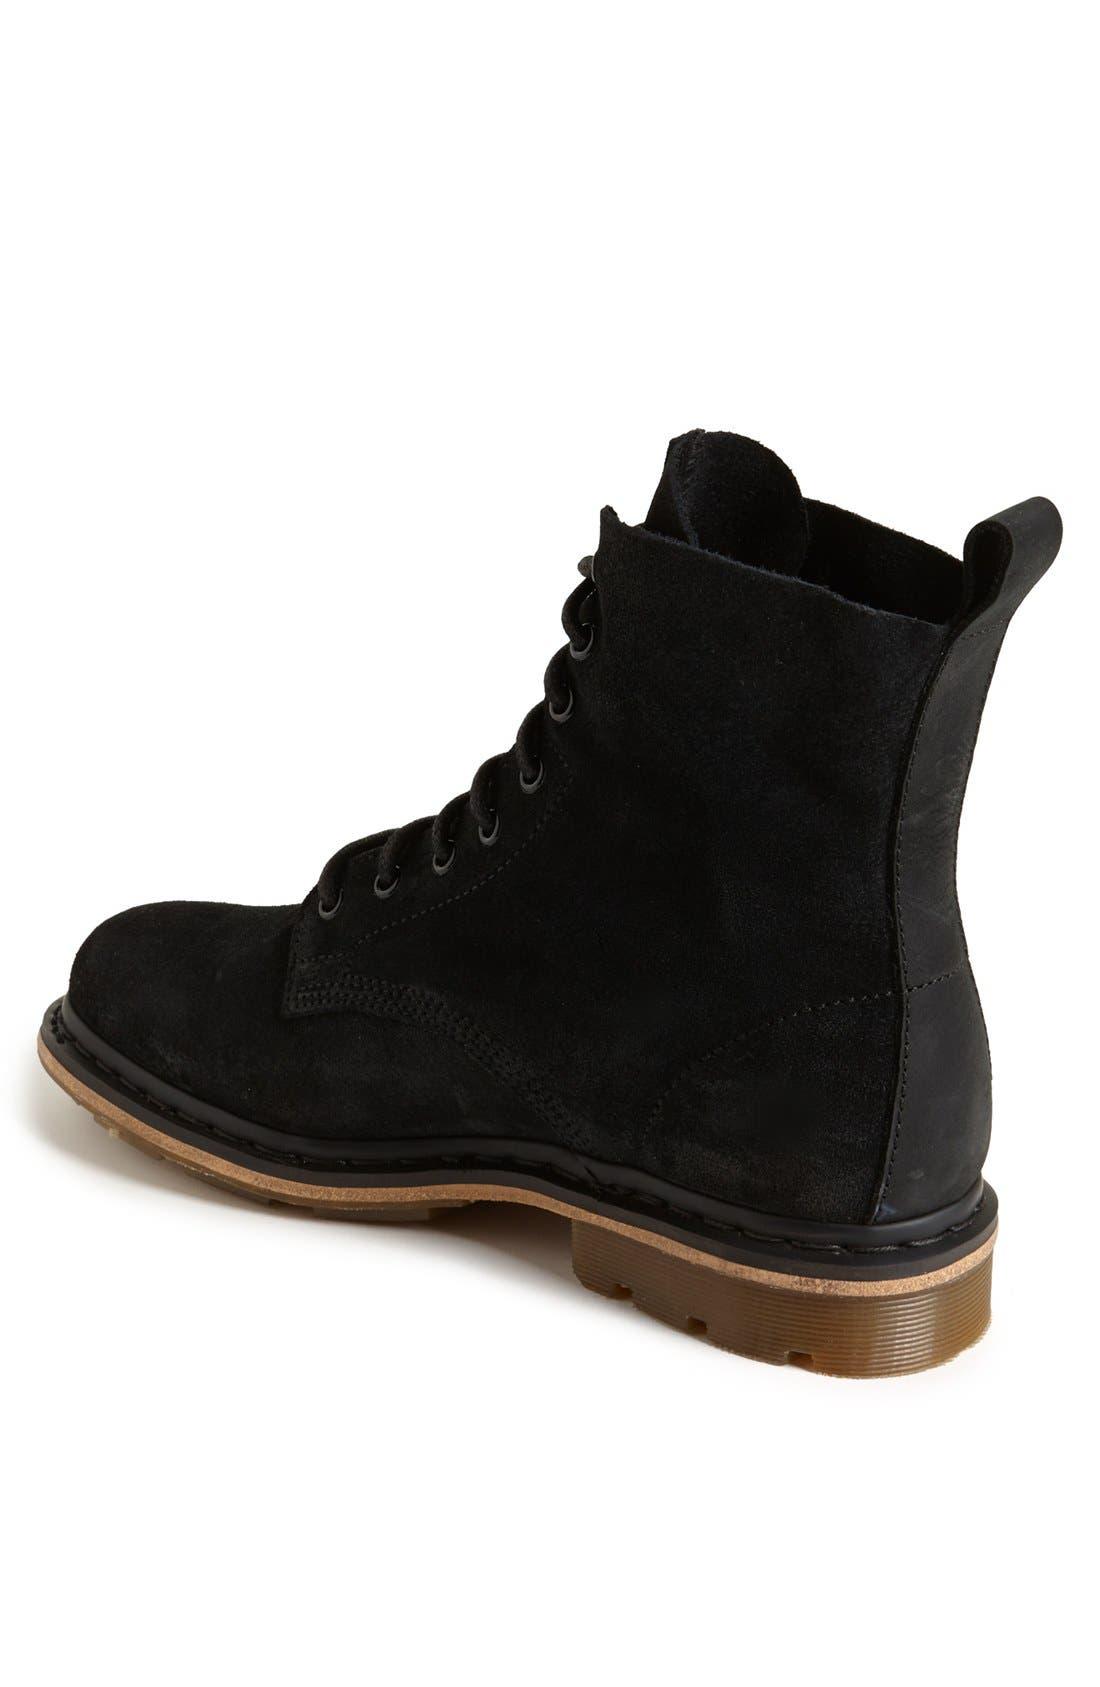 Alternate Image 2  - Dr. Martens 'Nero' Suede Boot